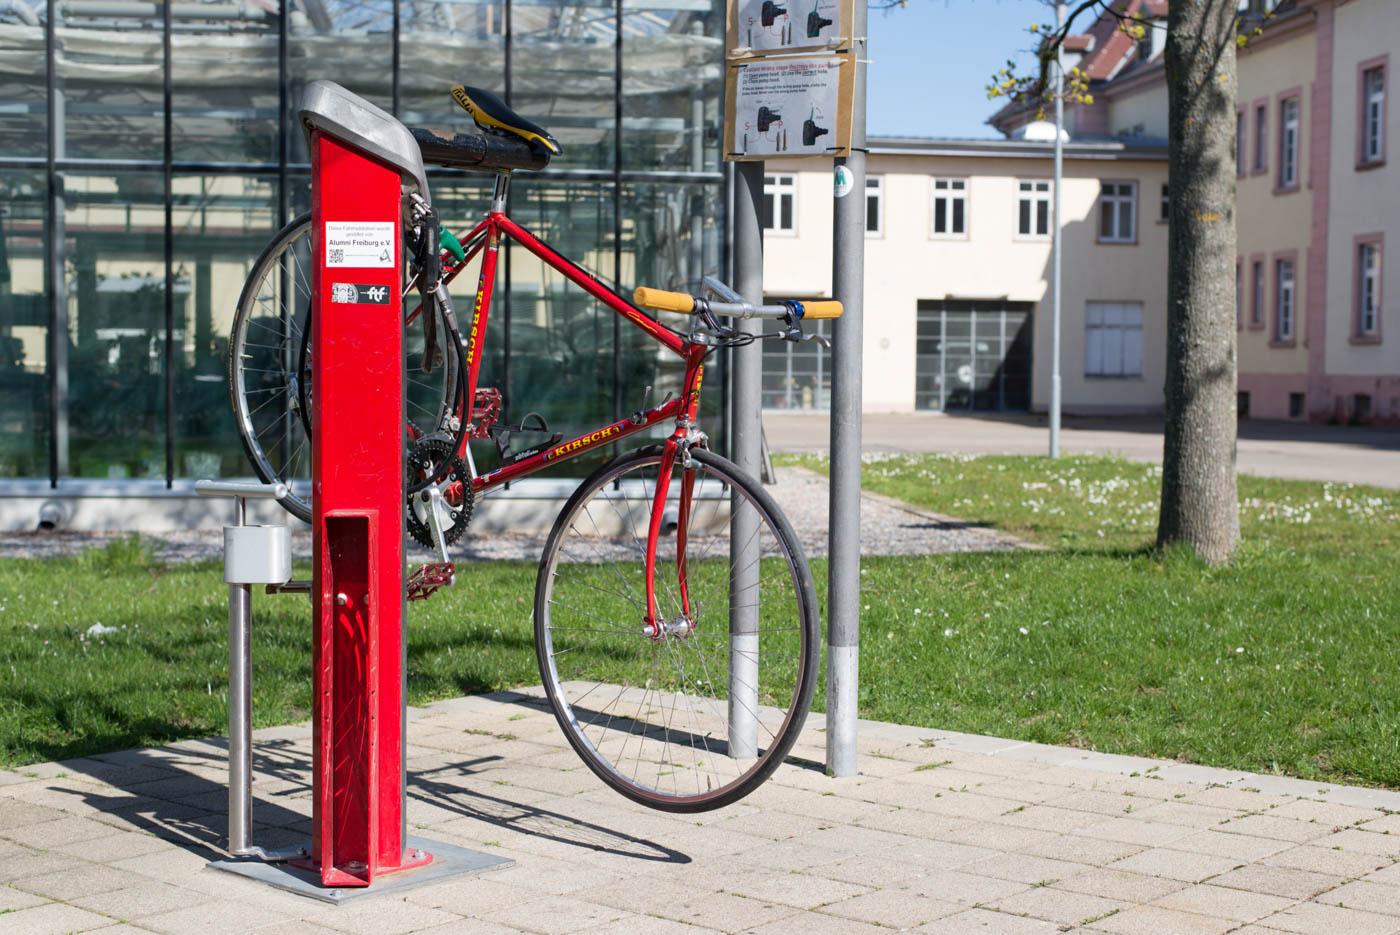 Das Fahrrad ist bereits repariert